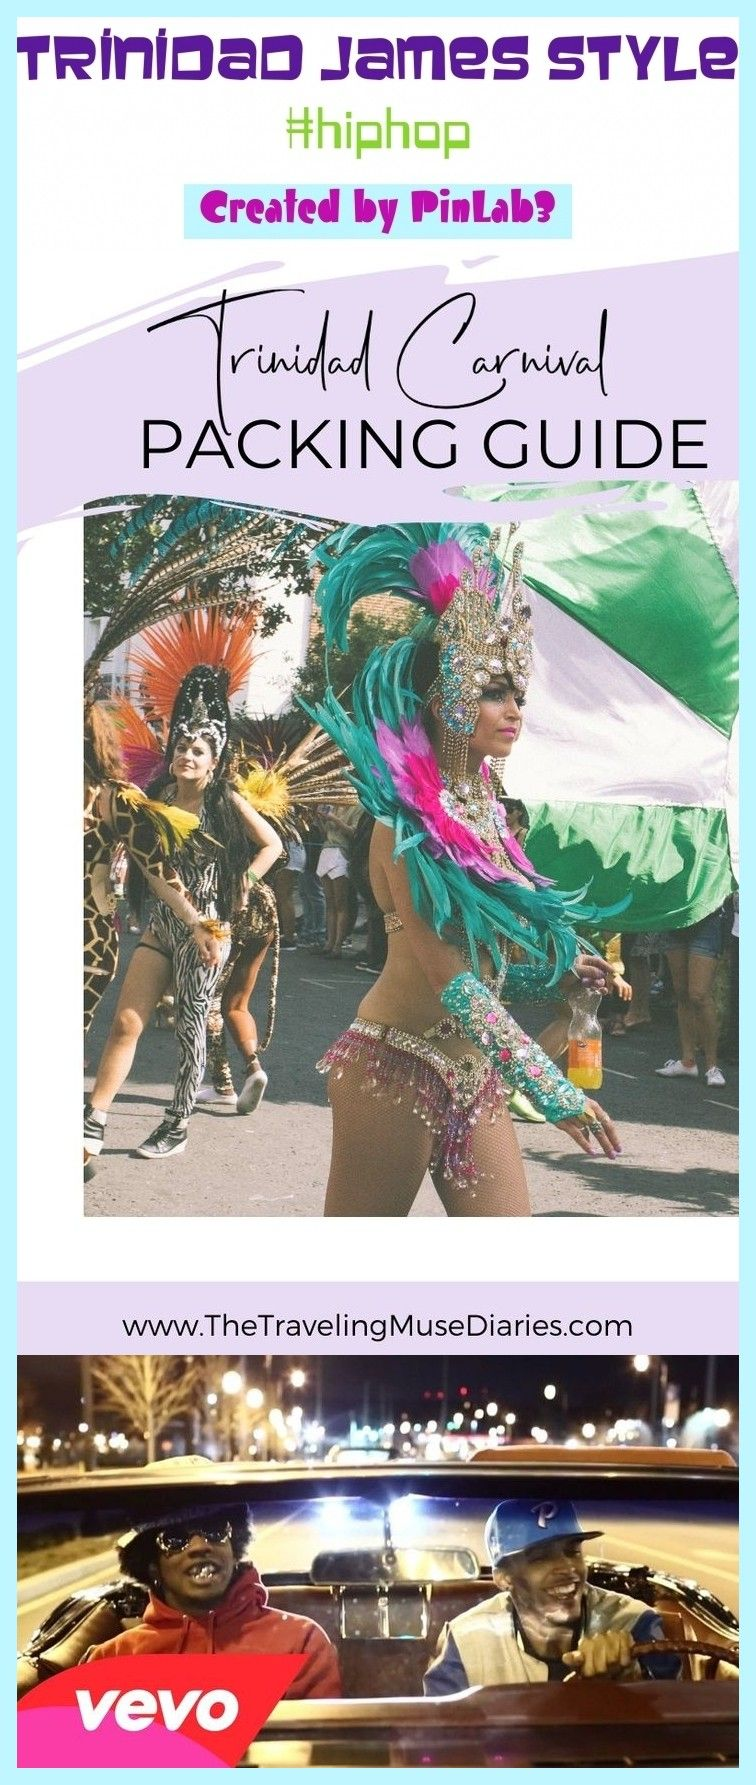 Trinidad james style #trinidad #james #style Trinidad James Stil   trinidad james style   estilo trinidad james   trinidad james style, trinidad james fashion, trinidad james hair